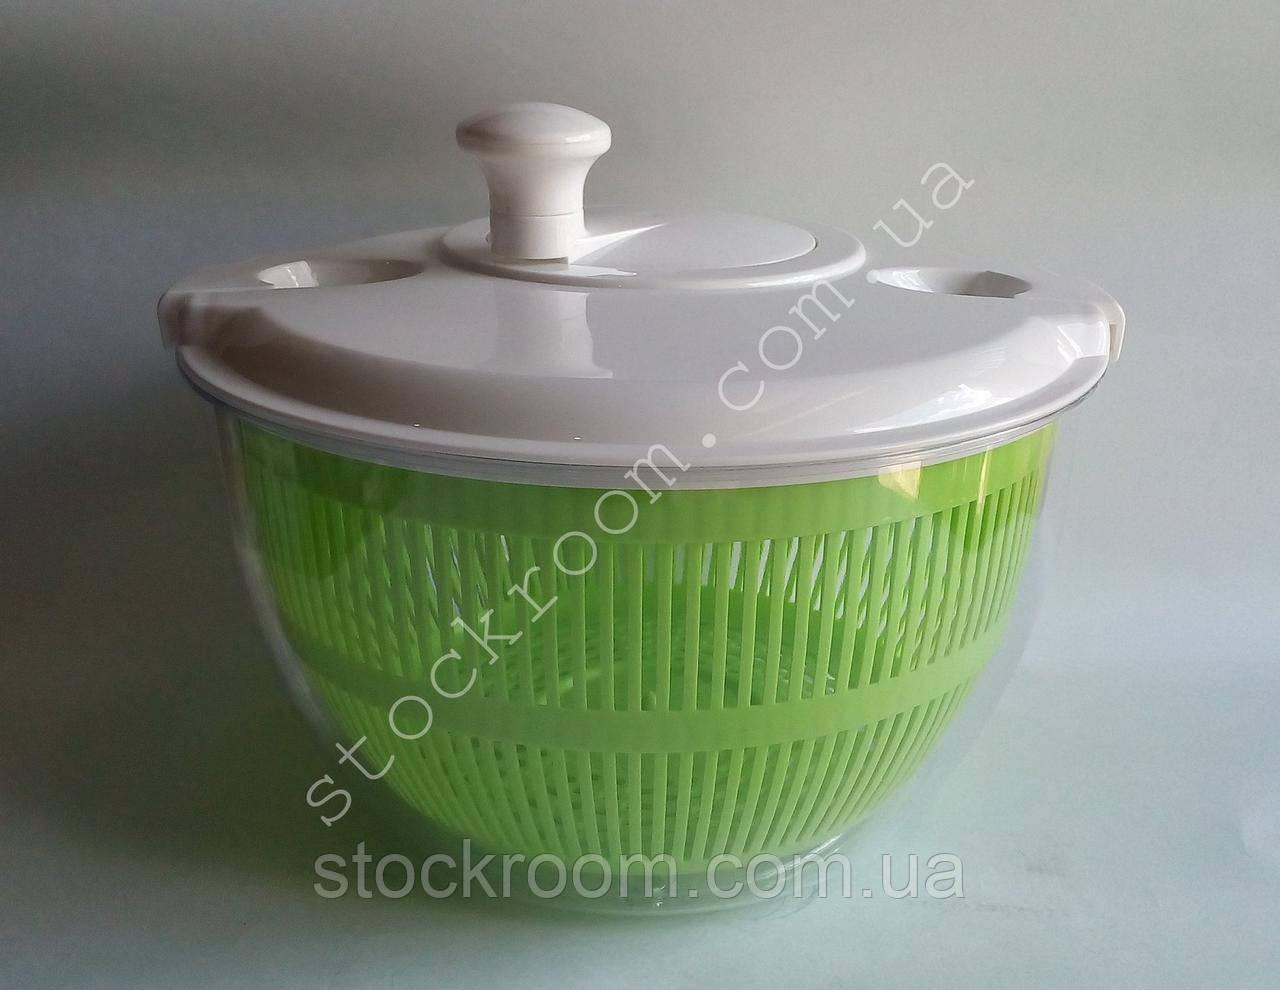 Сушка для салата и зелени Hilton XI 5207 5л